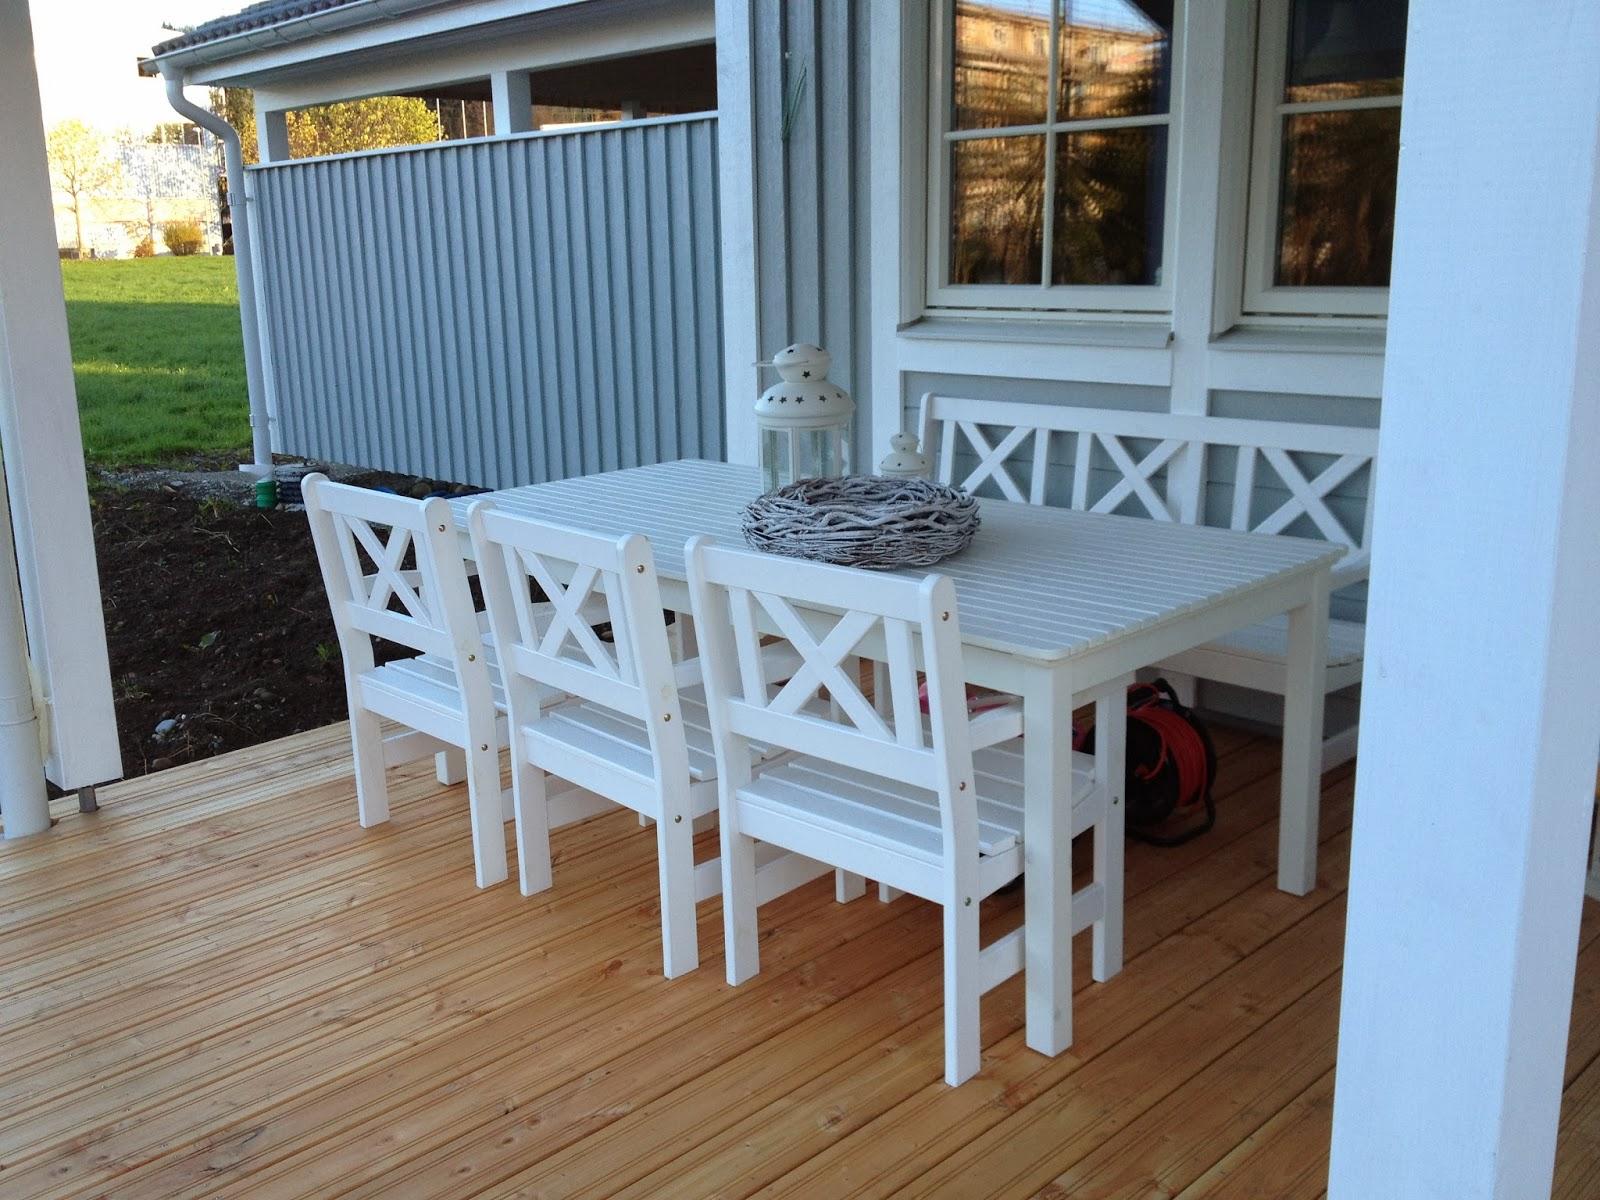 villajenal morgen und abenstimmung in der villa jenal. Black Bedroom Furniture Sets. Home Design Ideas